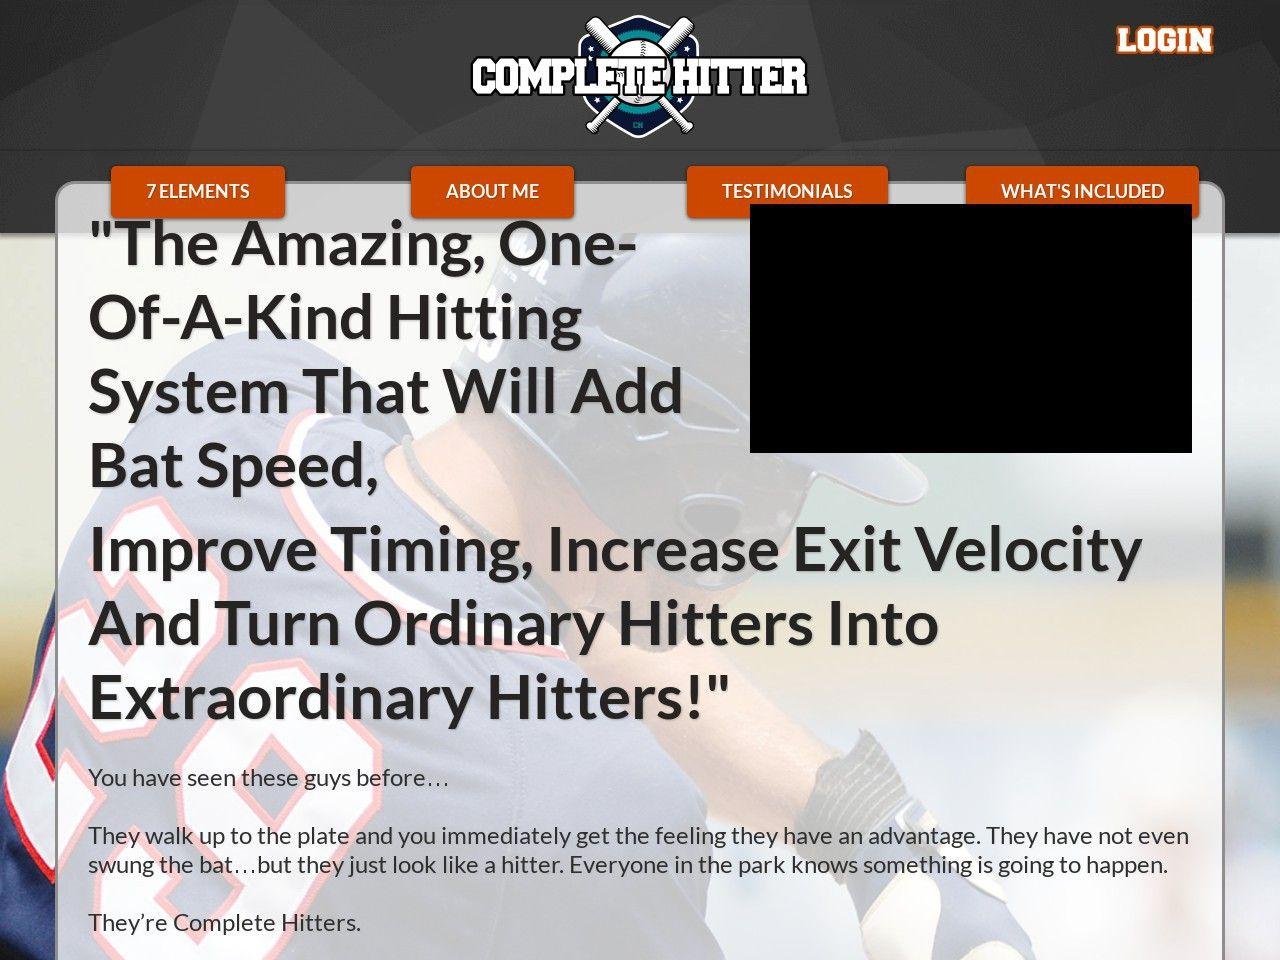 [Get] Complete Hitter - http://www.vnulab.be/lab-review/complete-hitter ,http://s.wordpress.com/mshots/v1/http%3A%2F%2Fforexrbot.bbharrison.hop.clickbank.net